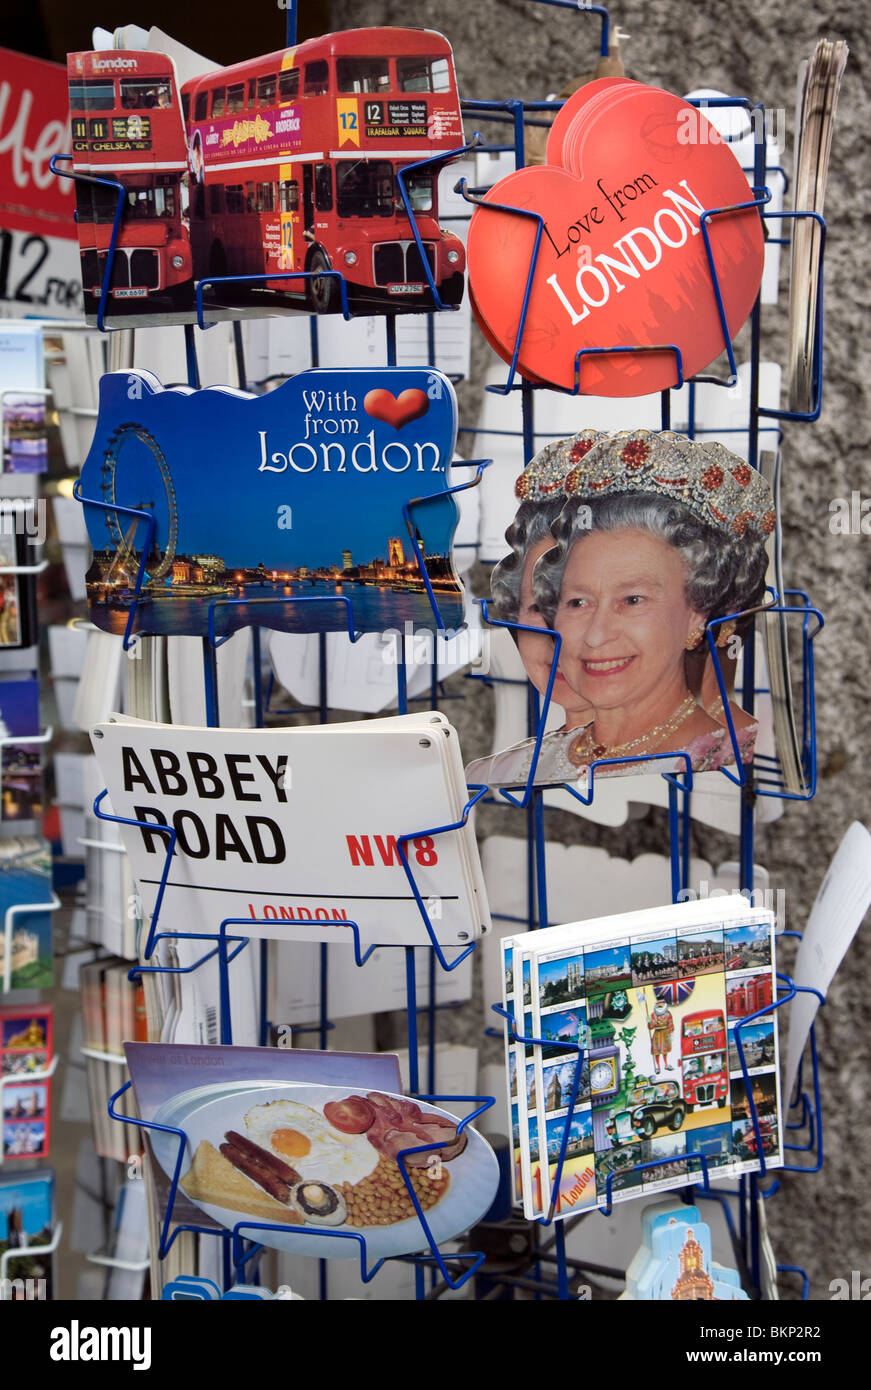 Postcards, London, England - Stock Image